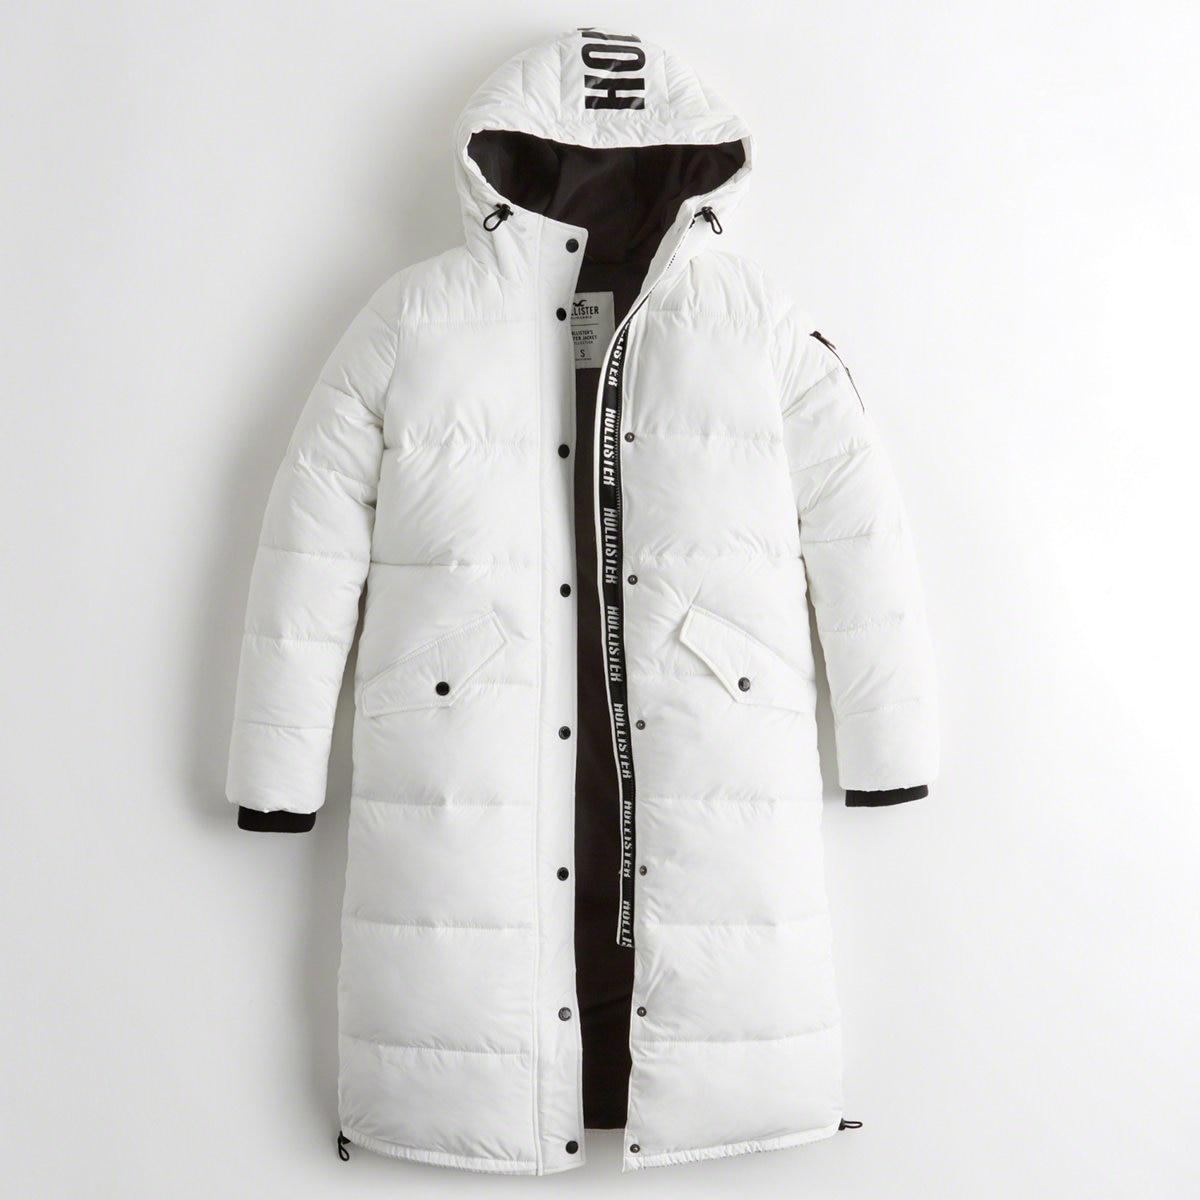 48e972820 Lyst - Hollister Girls Longline Puffer Parka From Hollister in White